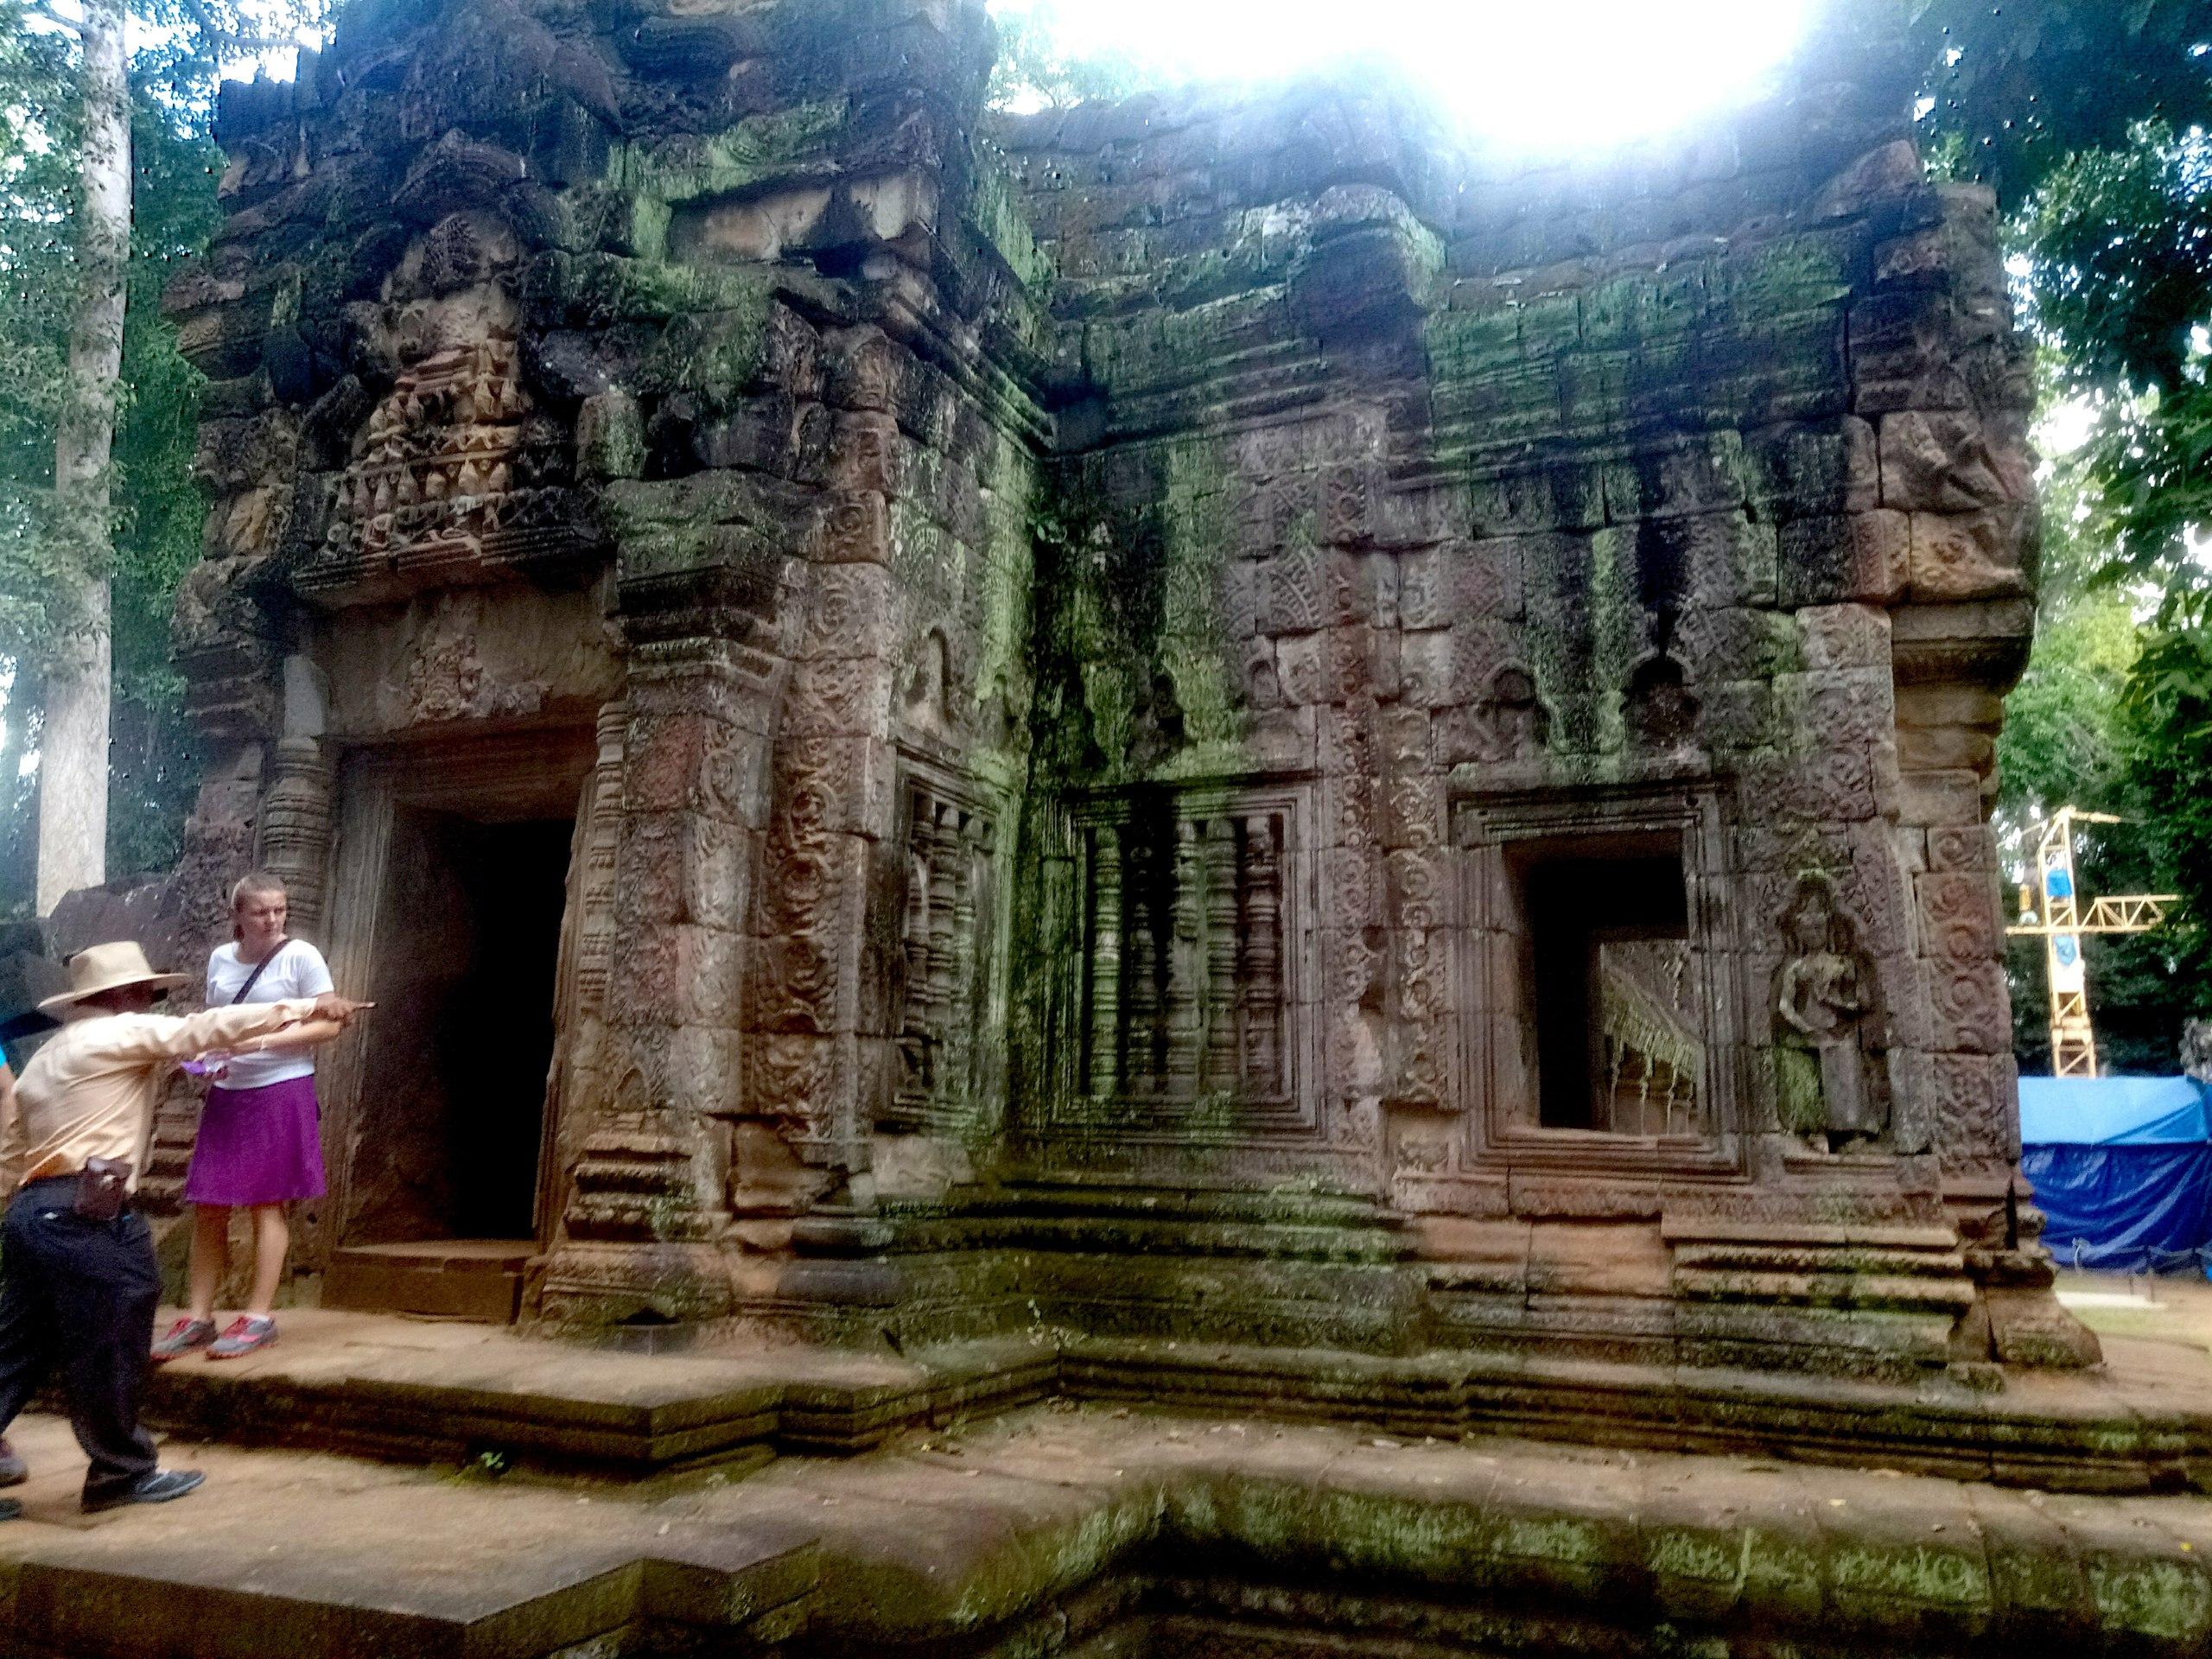 Елена Руденко (Валтея). Камбоджа. Ангкор. - Страница 3 2HAwnsV2-38